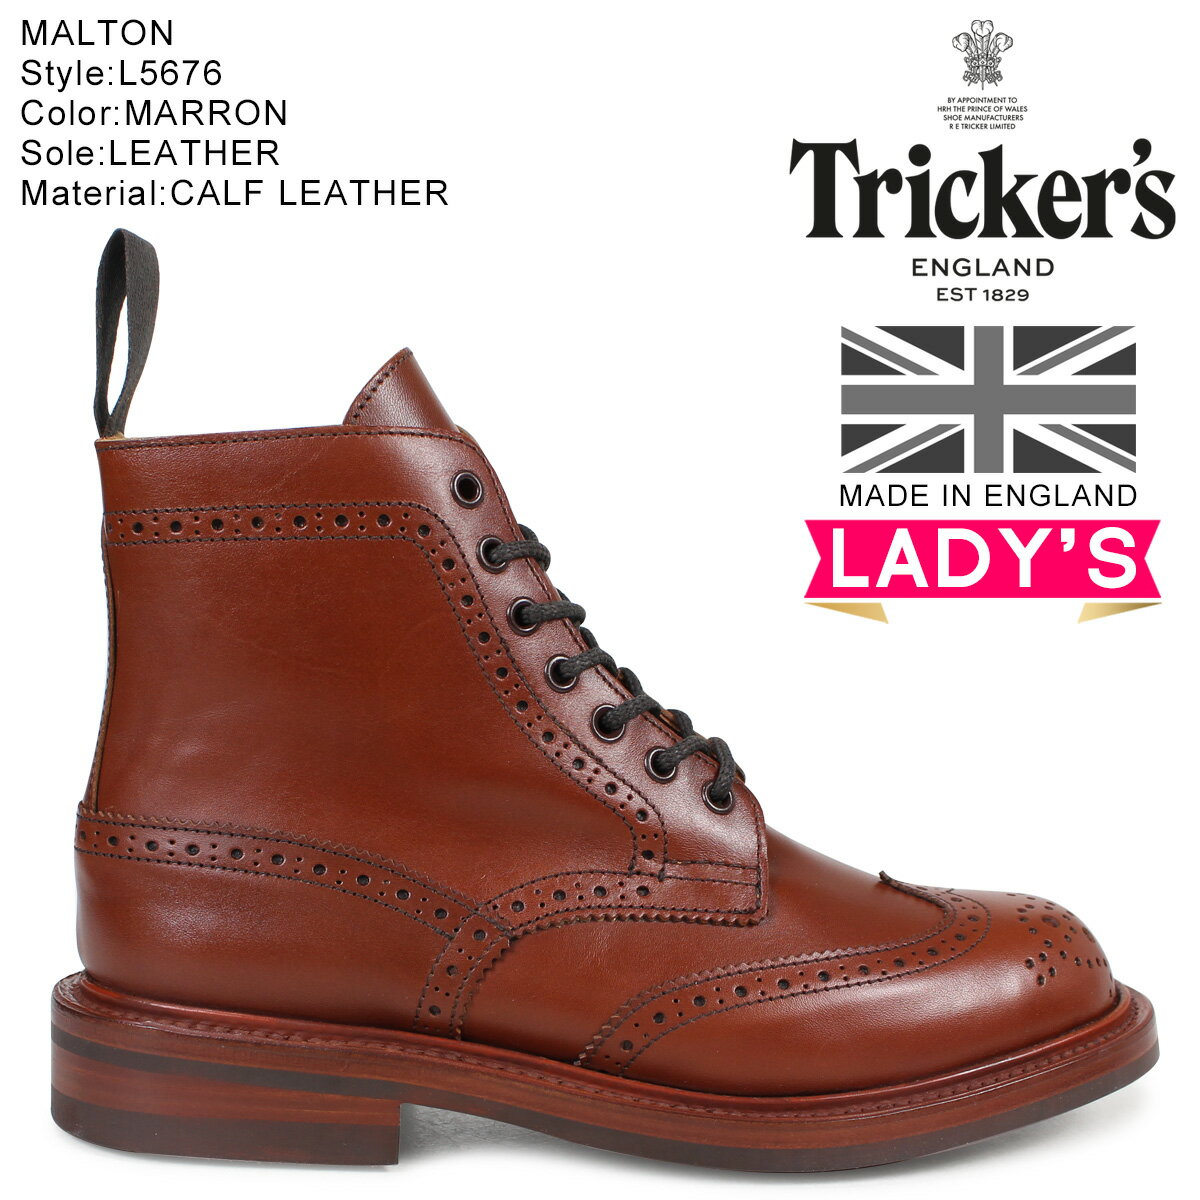 Tricker's トリッカーズ レディース カントリーブーツ MALTON L5676 4ワイズ ダークブラウン [予約商品 2/24頃入荷予定 新入荷]